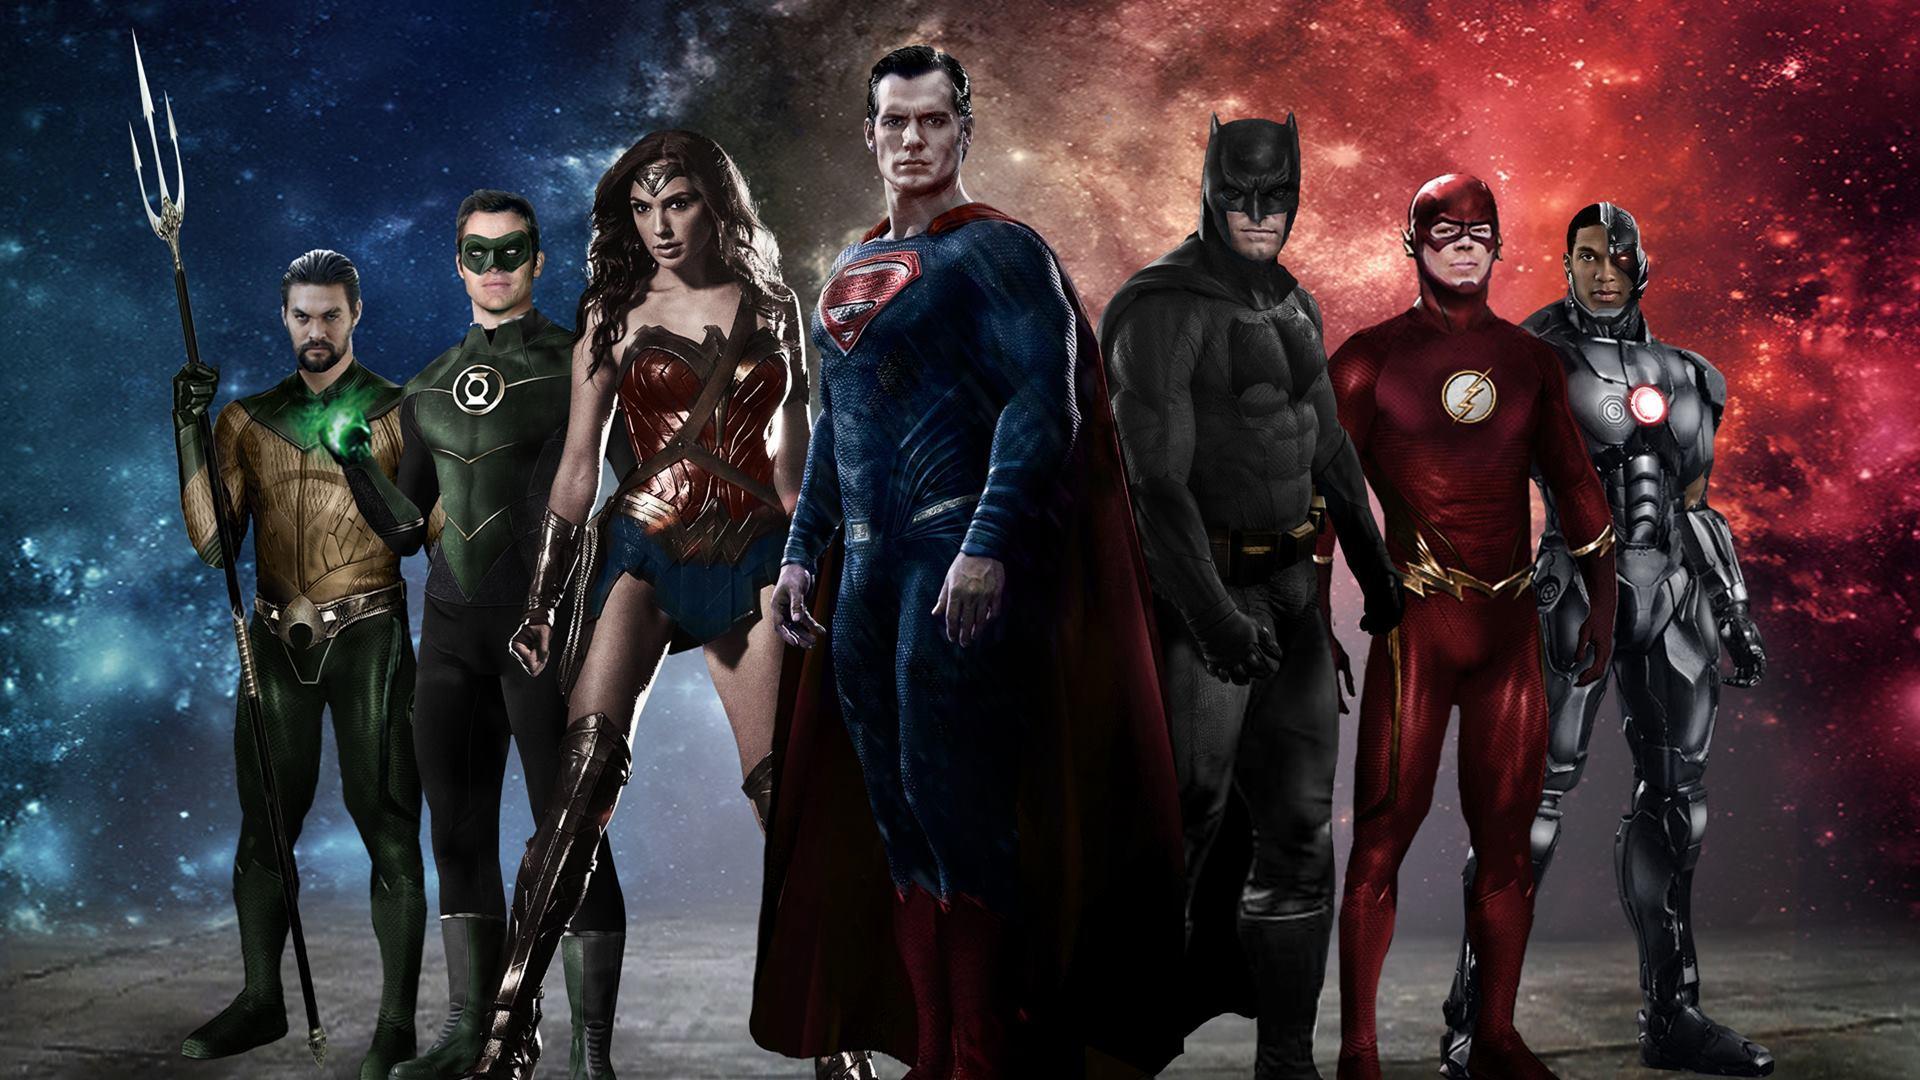 Batman Superman Wallpapers Free Superman Vs Batman Dawn Of